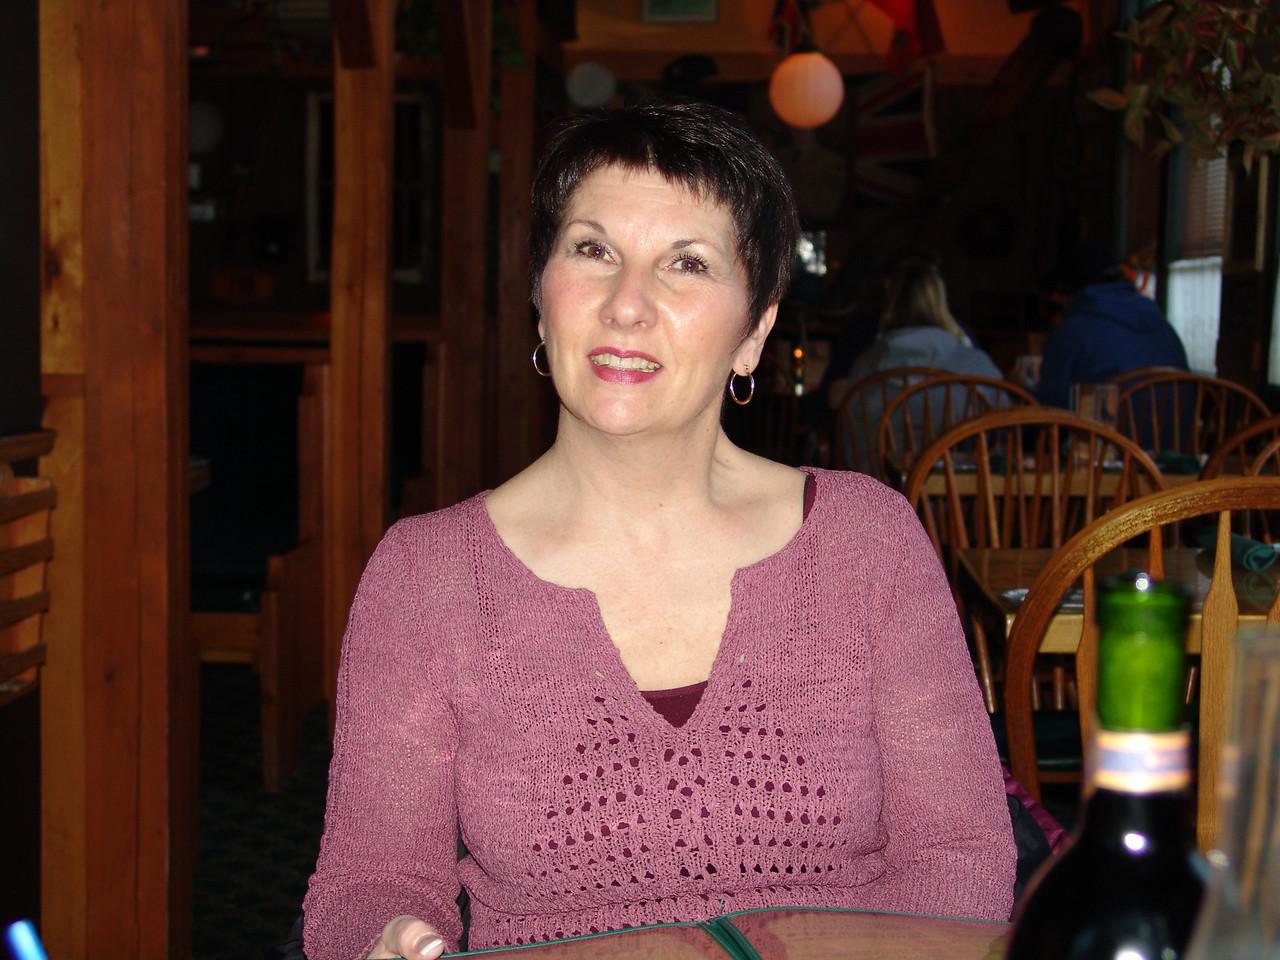 My mom at Uhler's birthday supper.